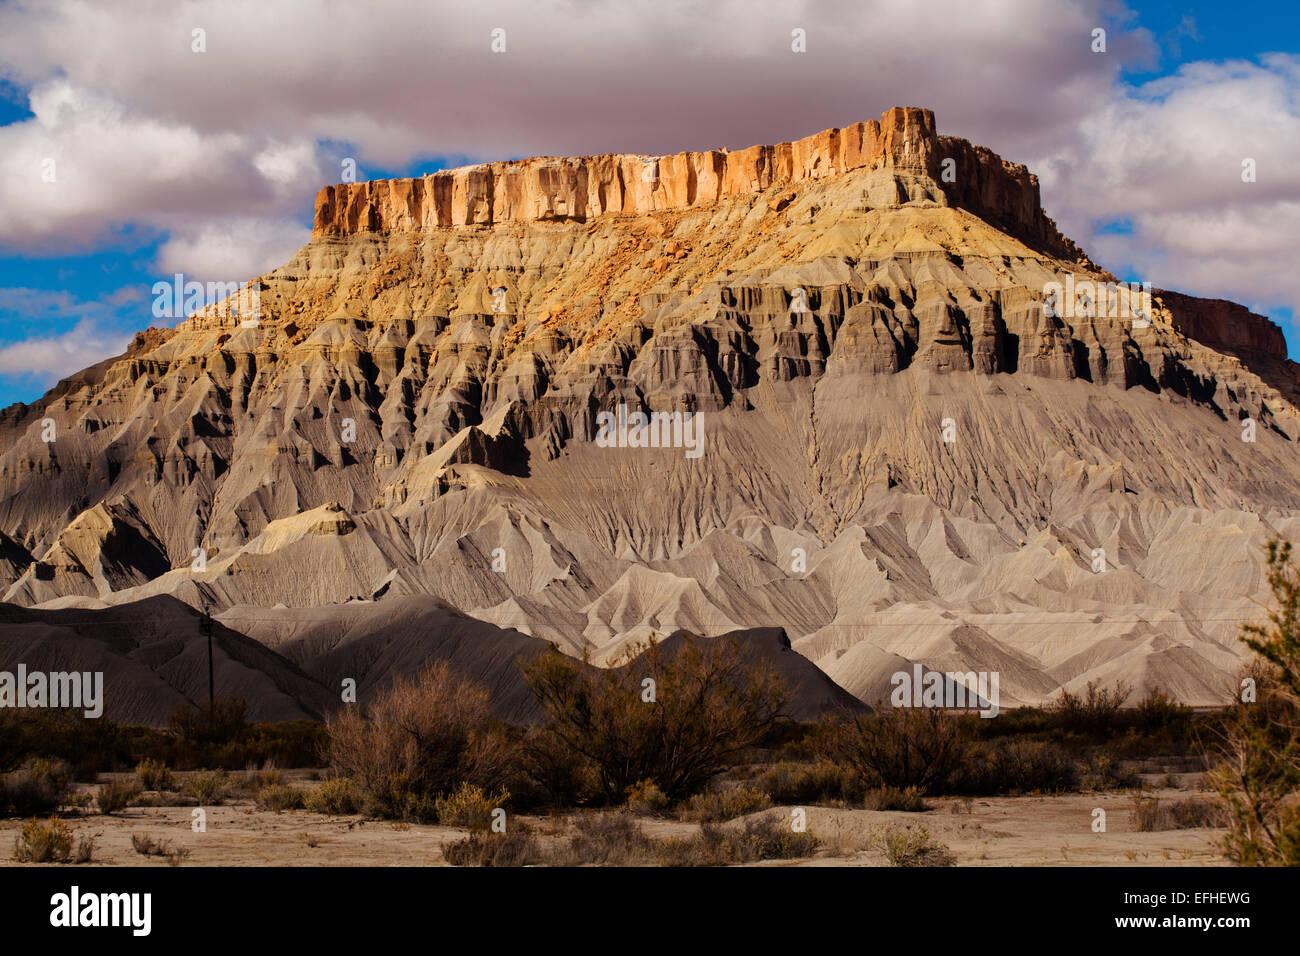 Sandstone butte layered over shale, near Capitol Reef National Park, Hanksville, Utah - Stock Image